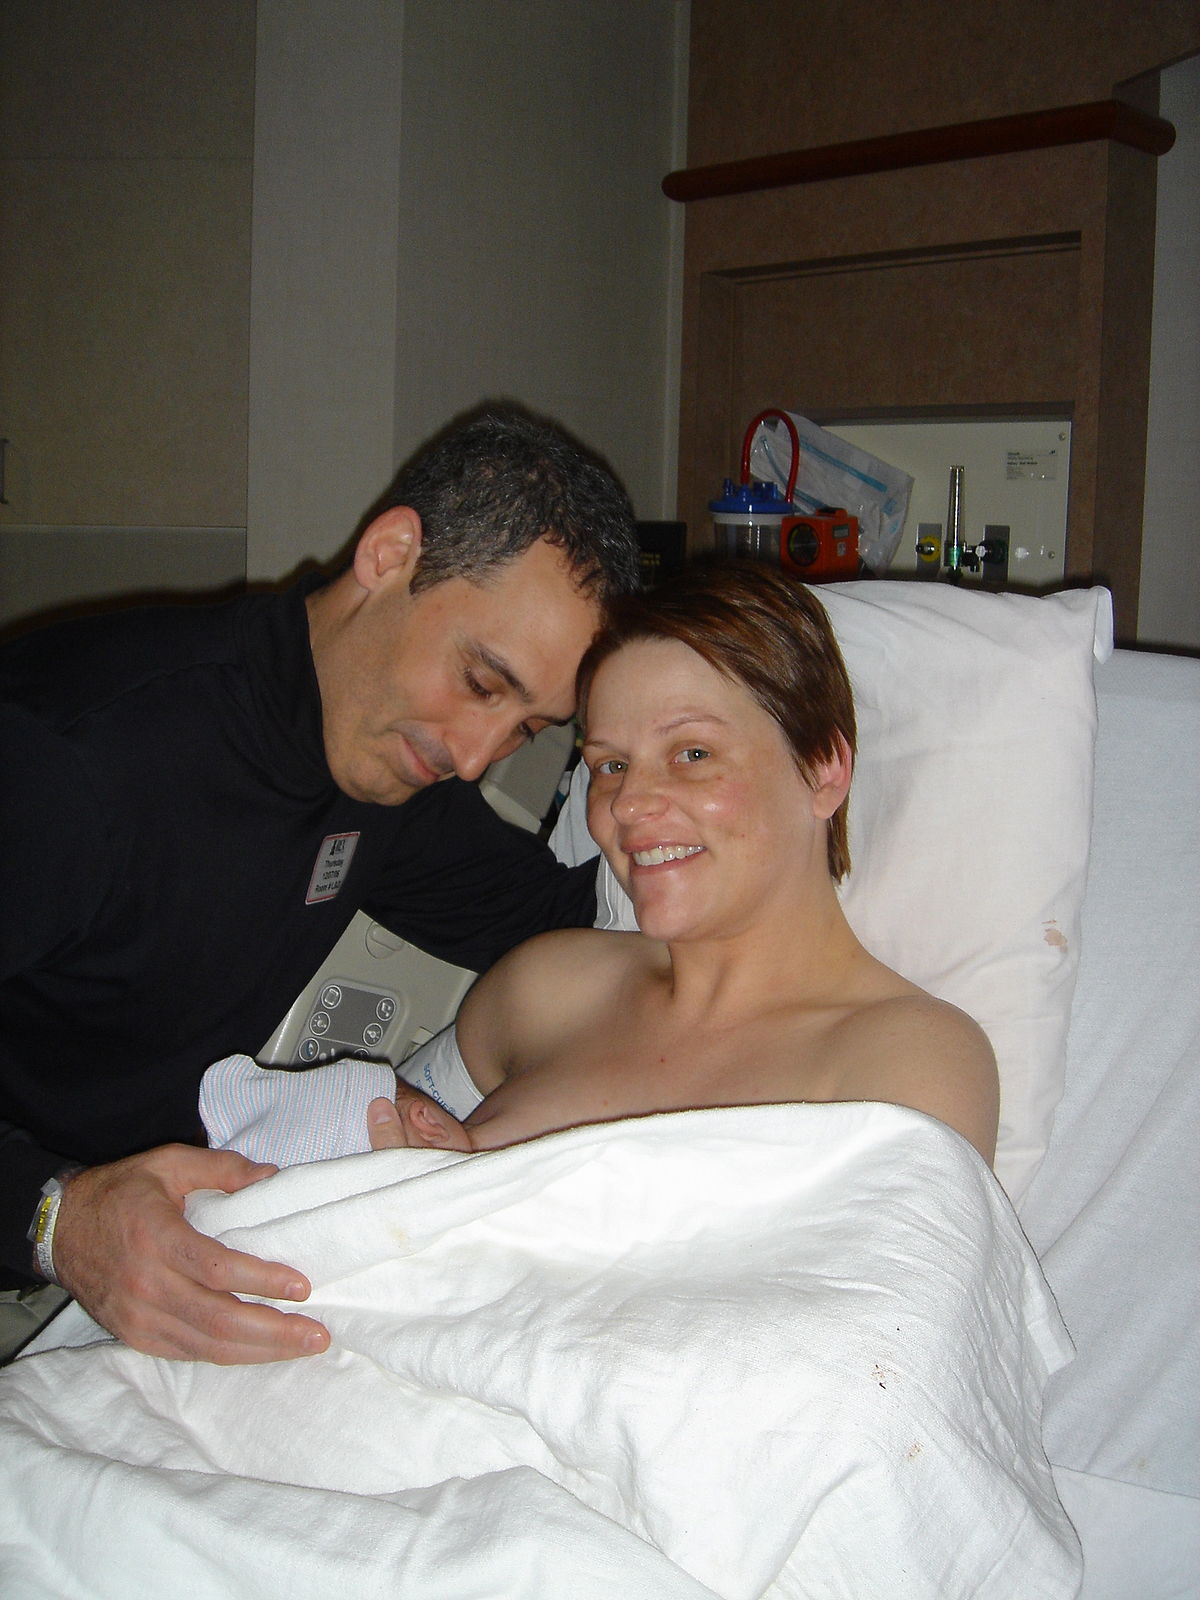 Voyeur breastfeeding